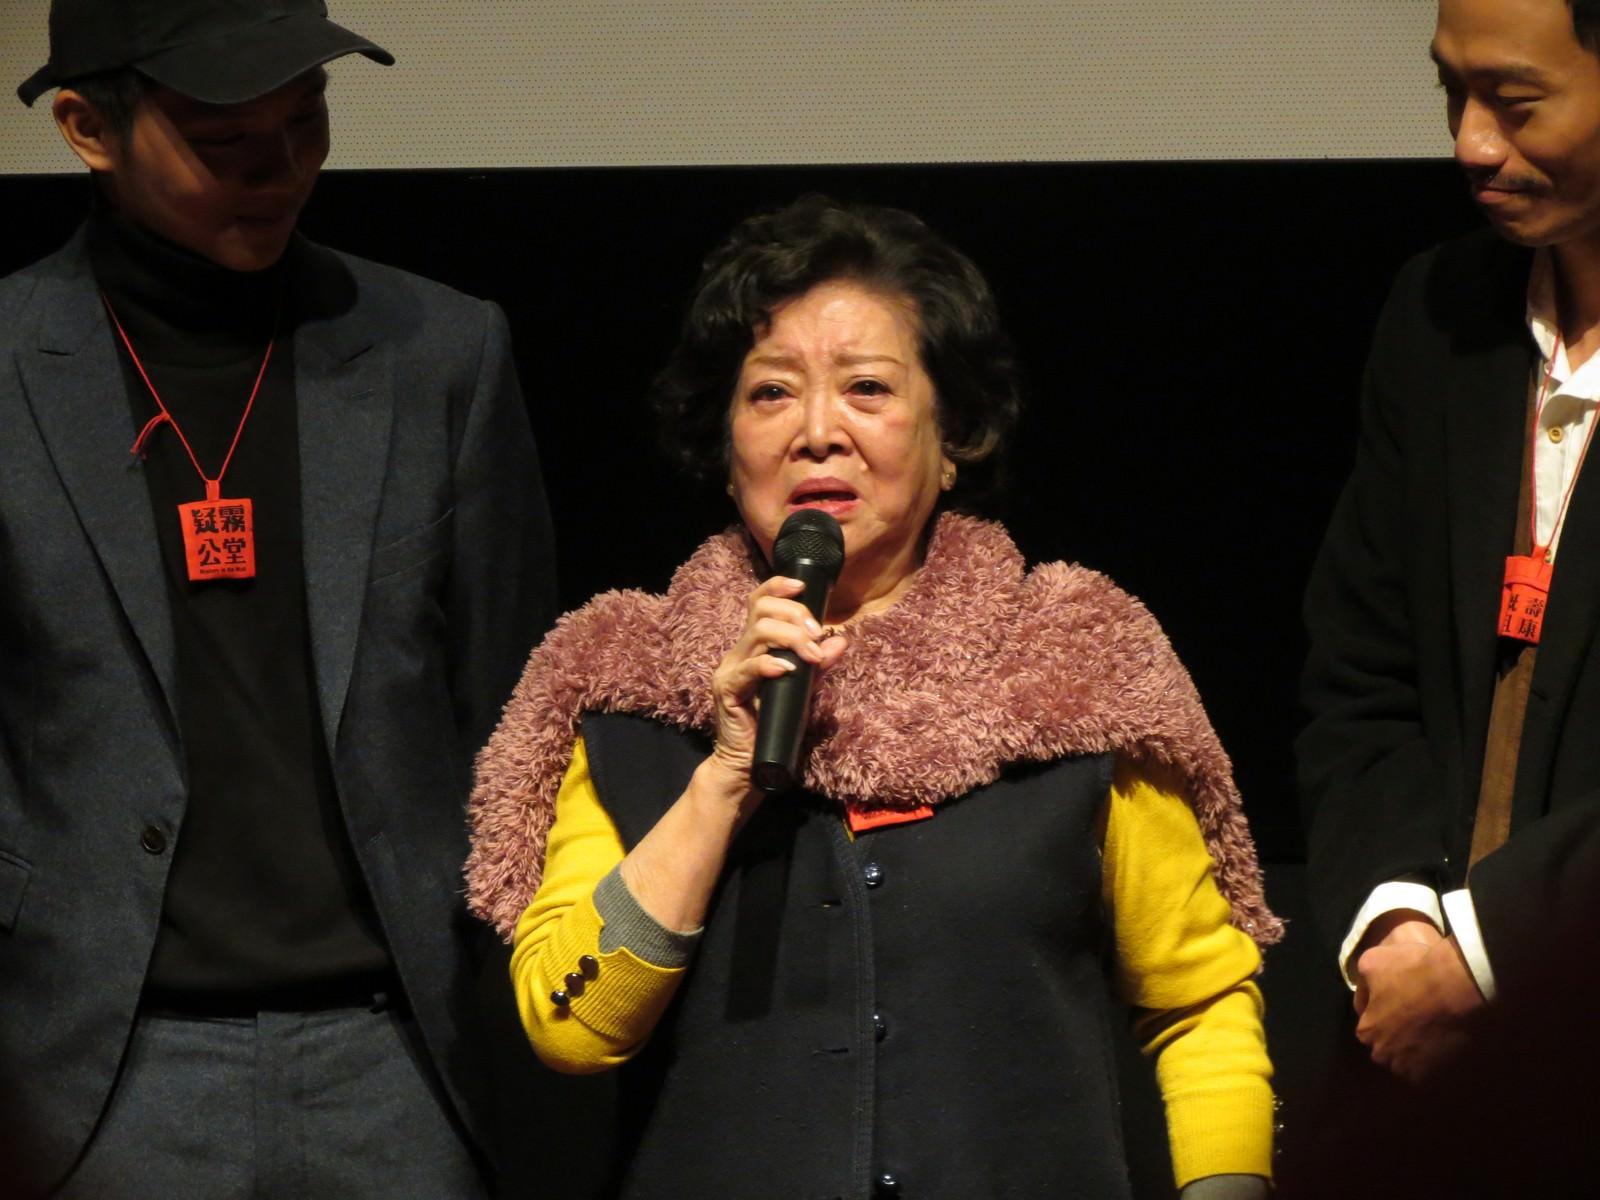 Movie, 疑霧公堂(台灣, 2019年) / Mystery in the Mist(英文), 特映會, 劇組映後座談, 演員陳淑芳